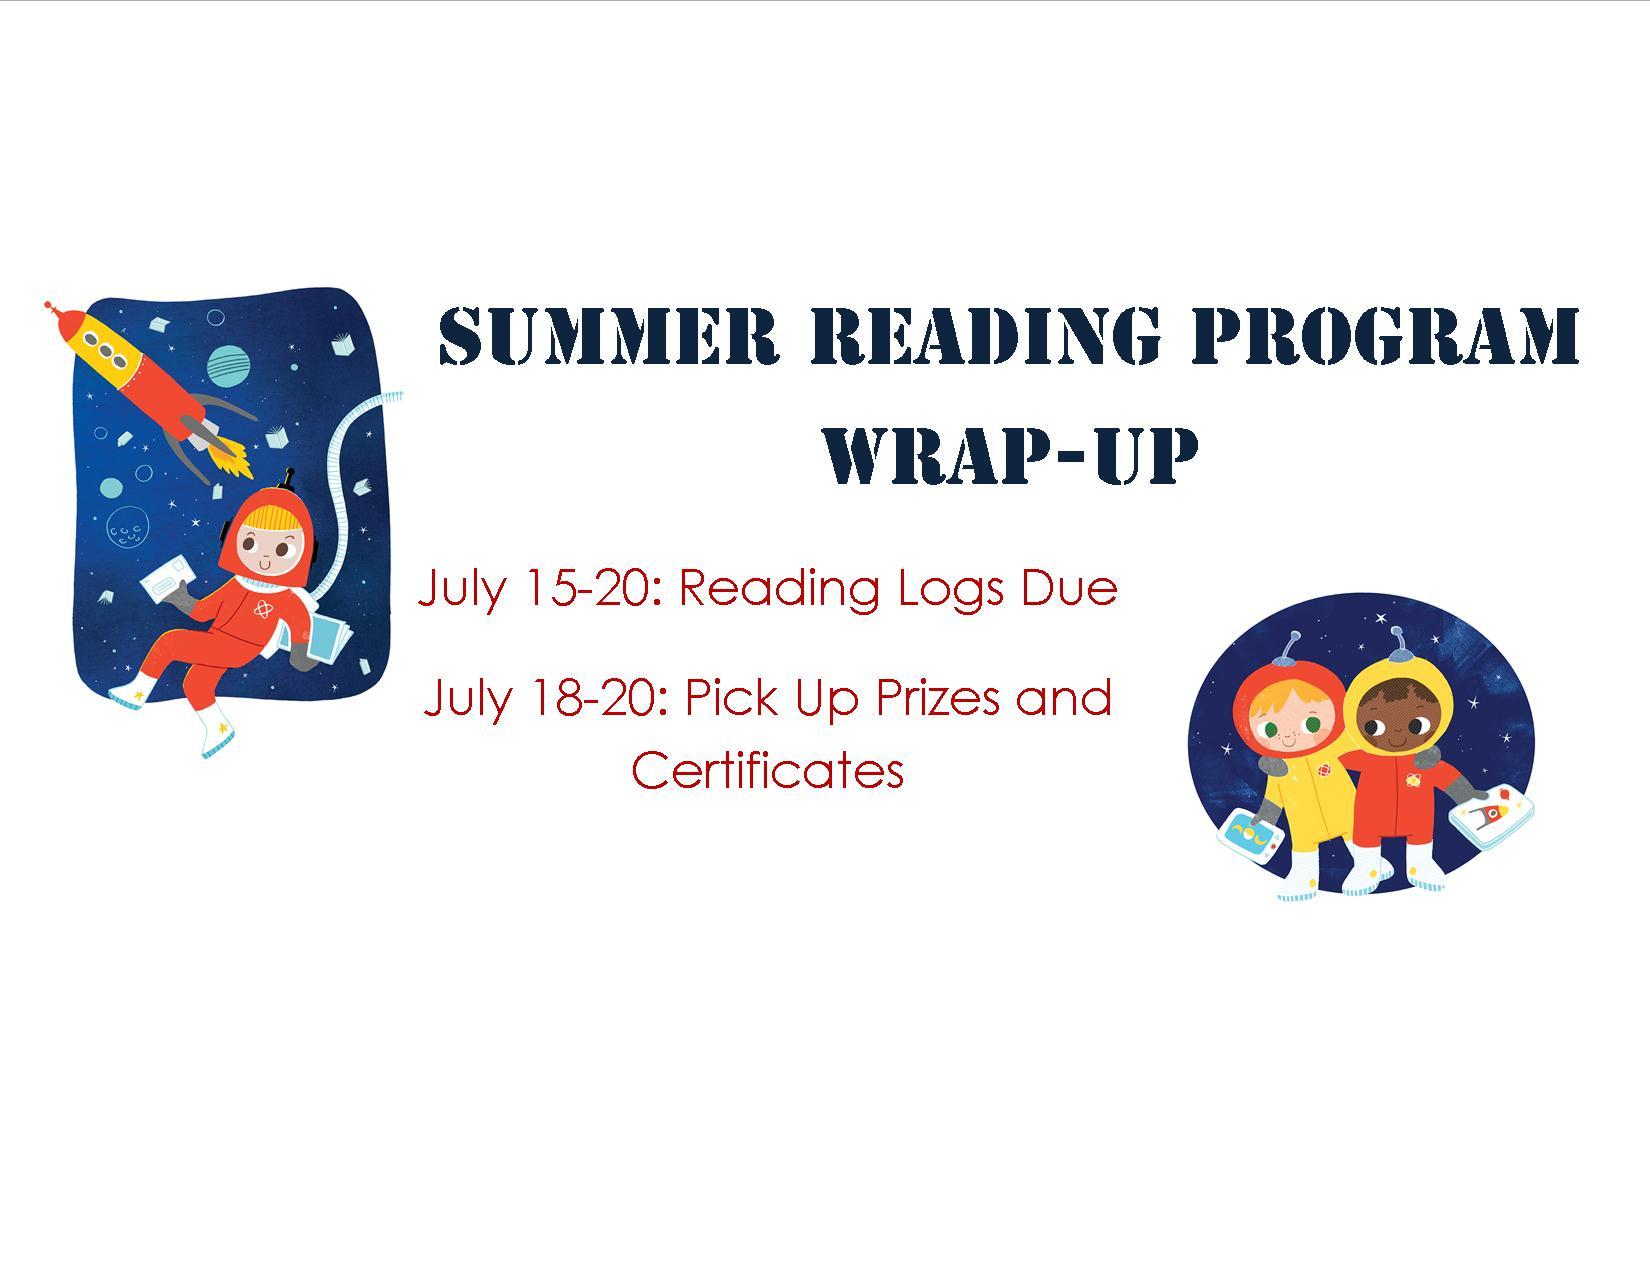 Summer Reading Program Wrap-Up